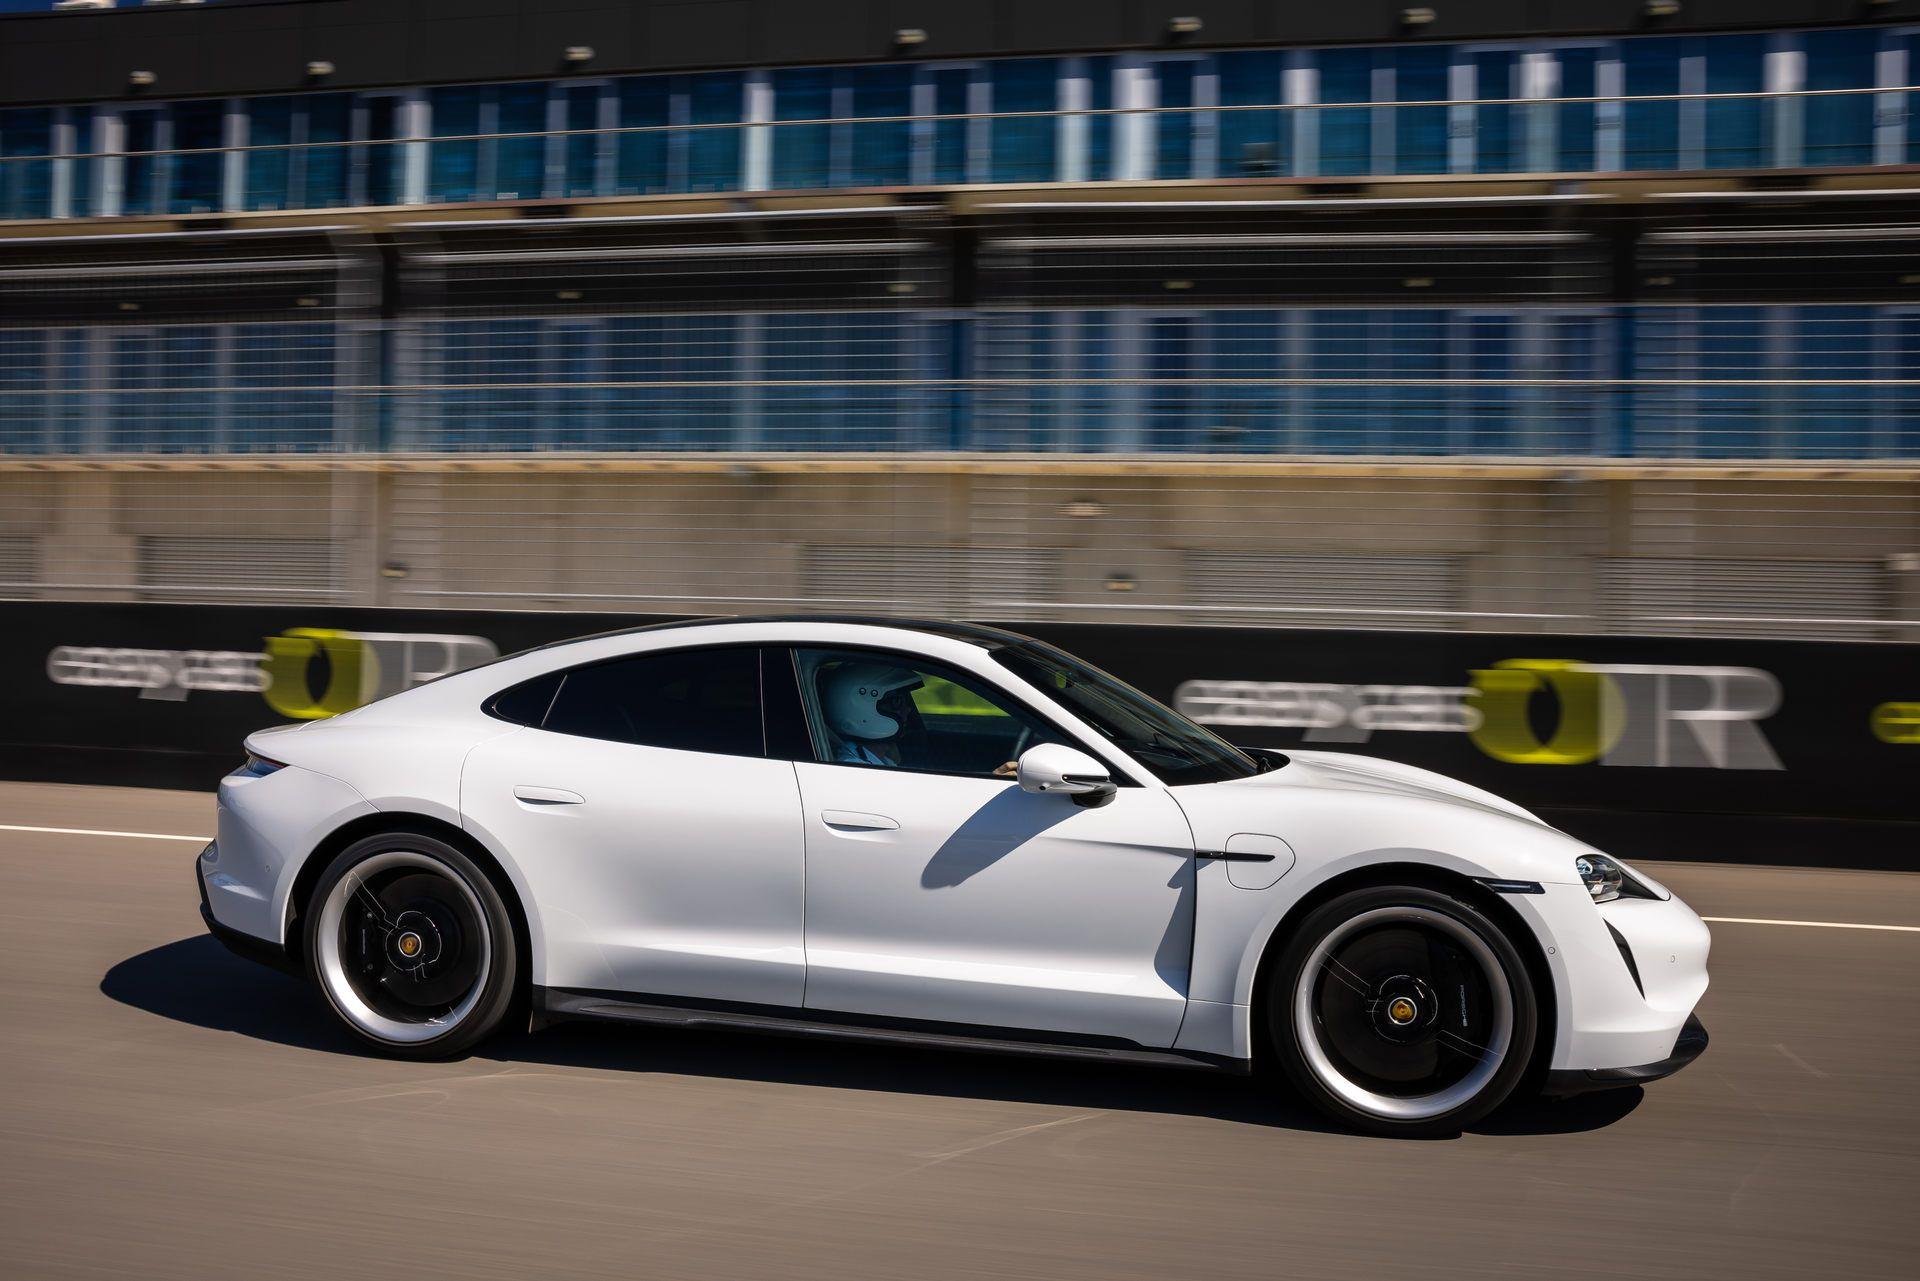 Porsche-Taycan-Turbo-S-The-Bend-Motorsport-Park-49